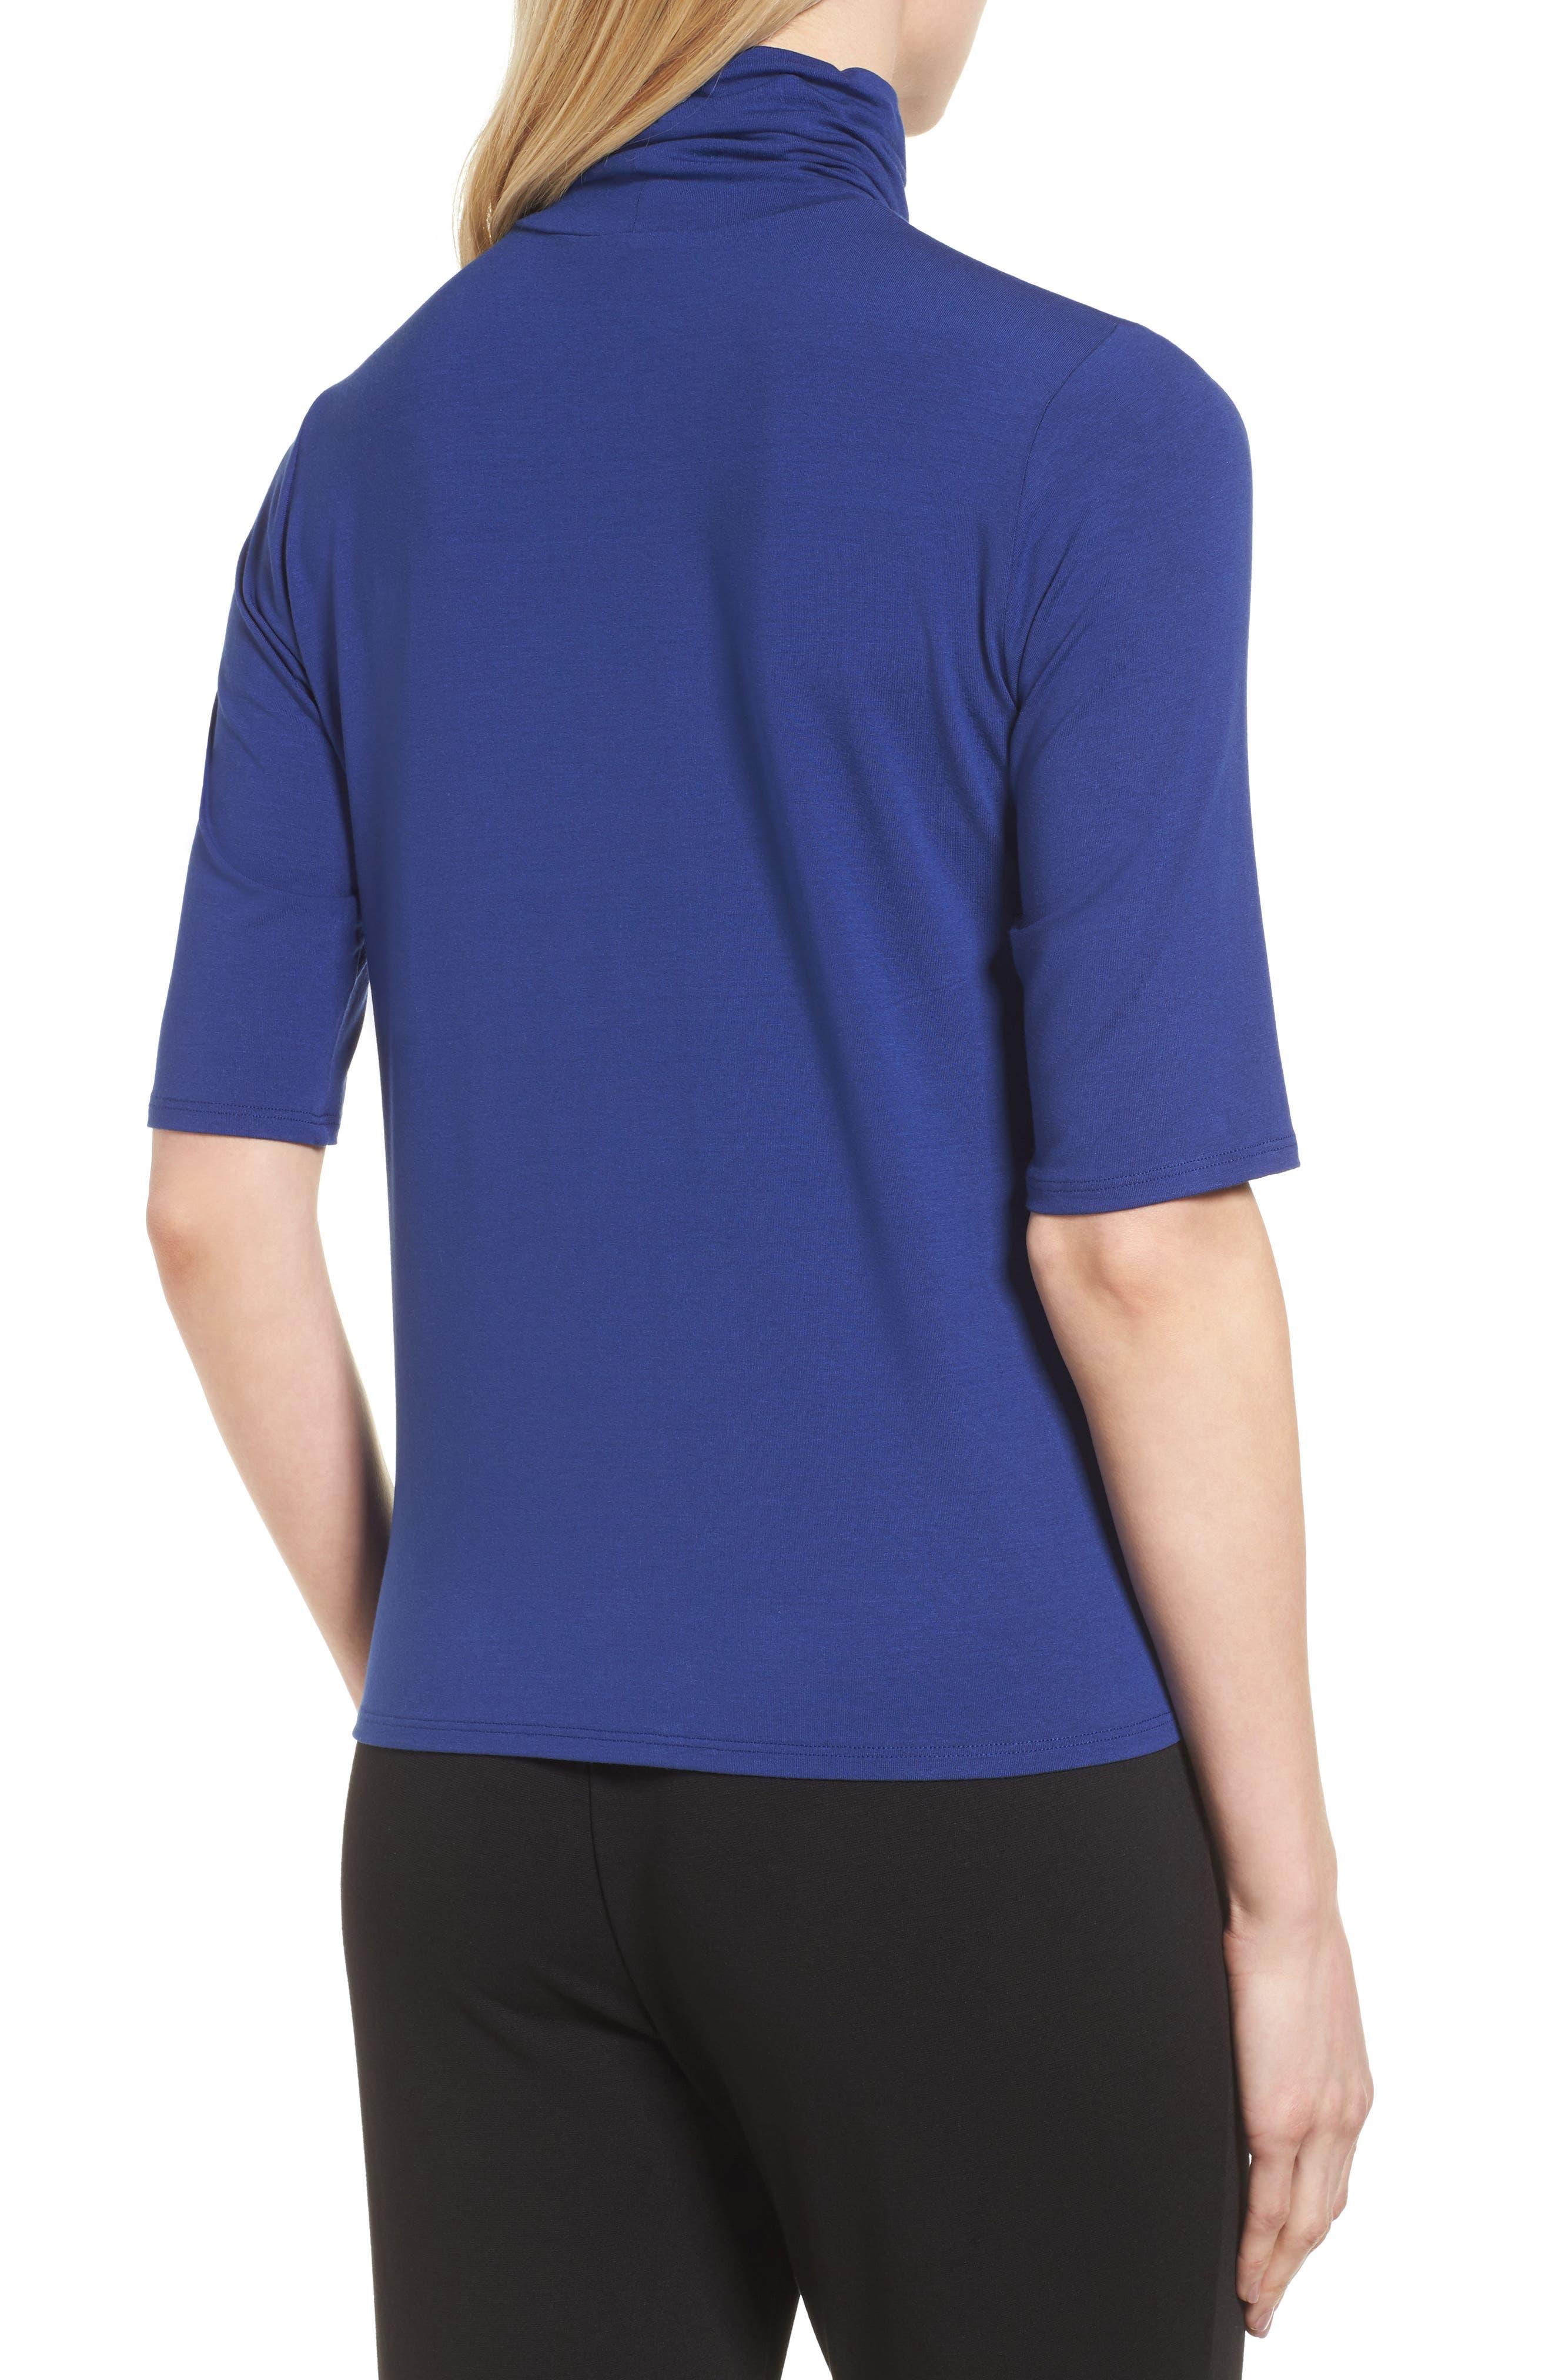 Alternate Image 2  - Eileen Fisher Scrunch Neck Jersey Top (Regular & Petite)